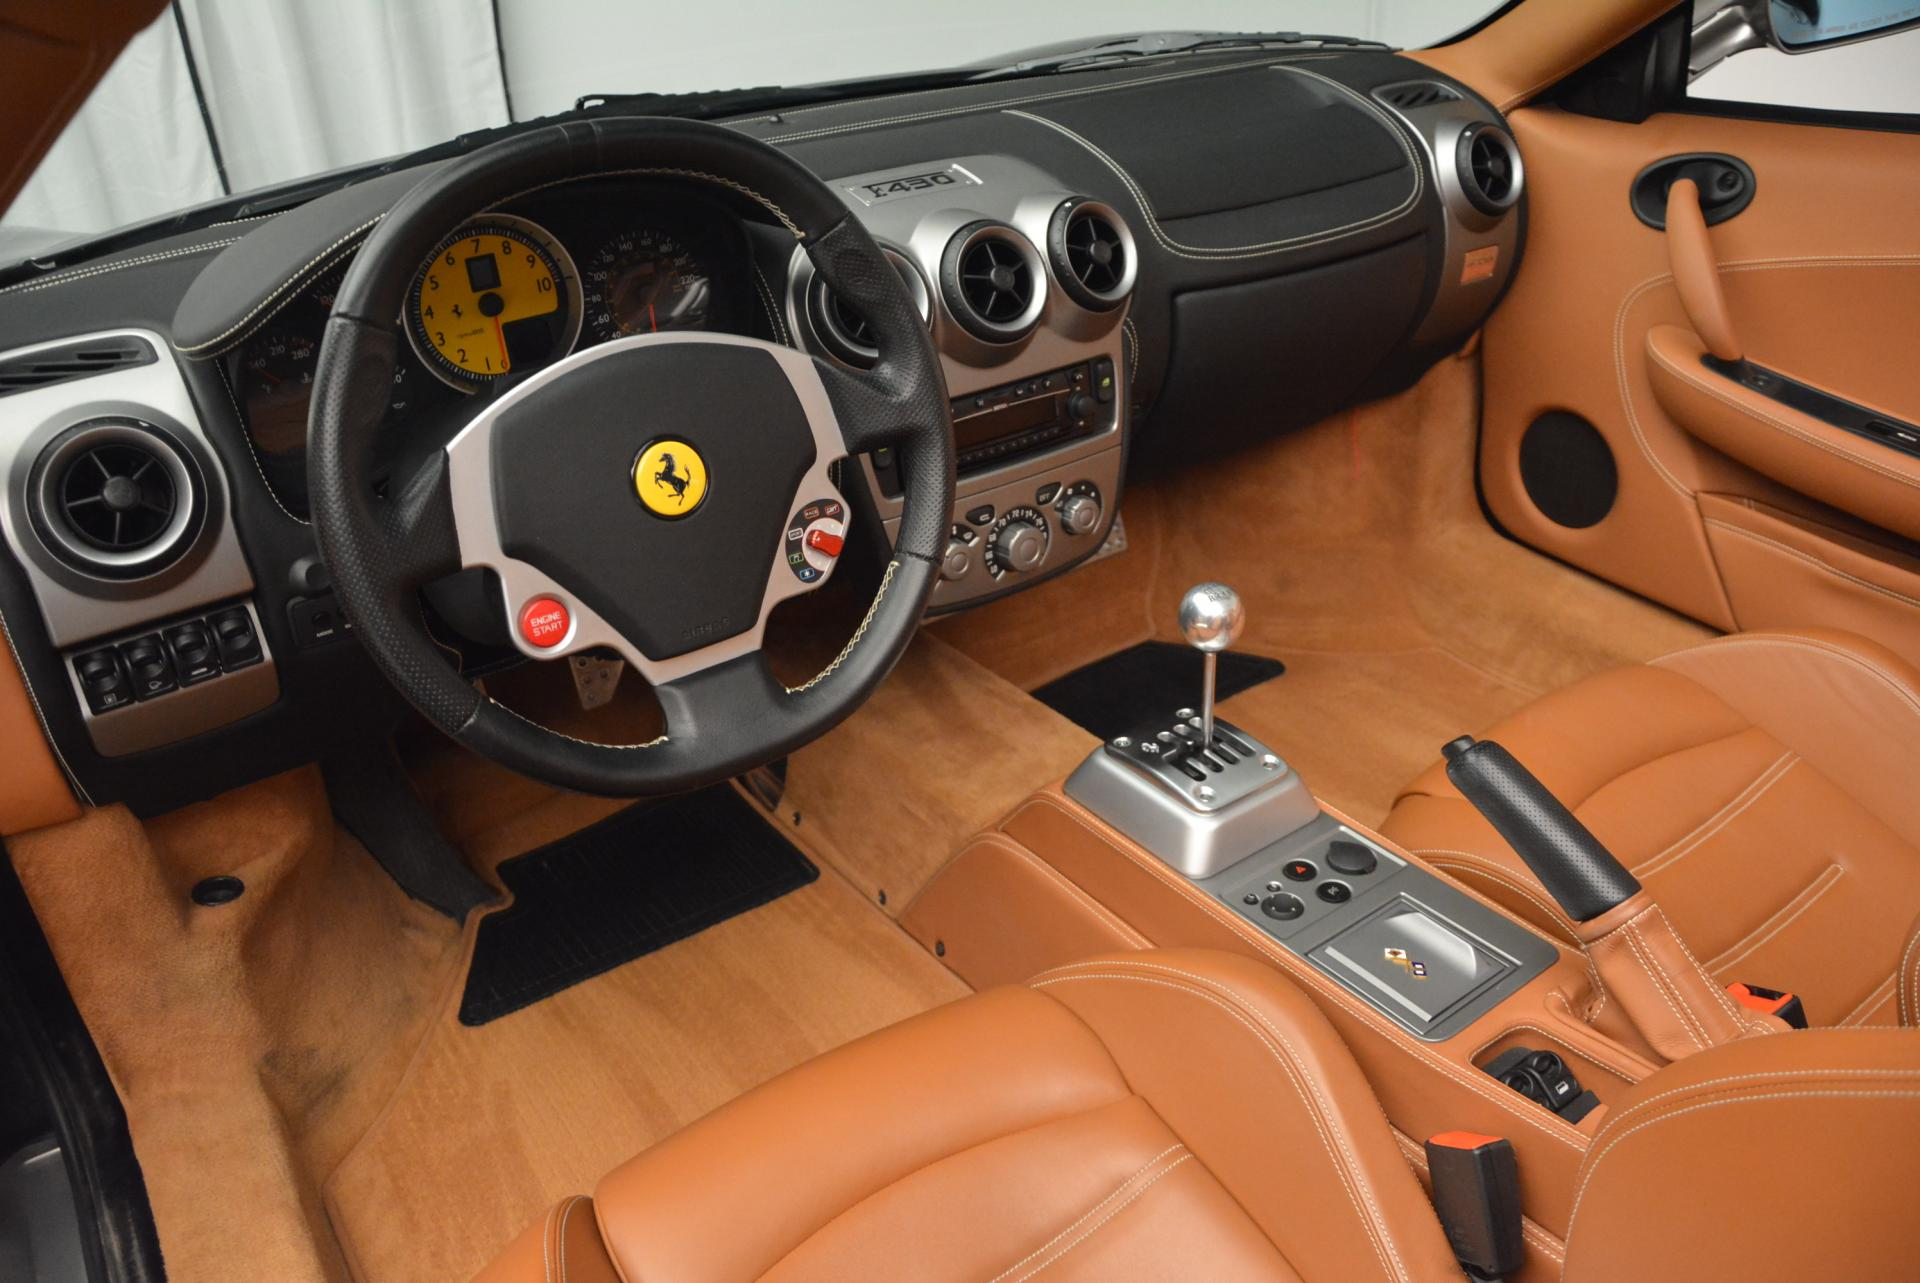 Used 2005 Ferrari F430 Spider 6-Speed Manual For Sale In Westport, CT 135_p25